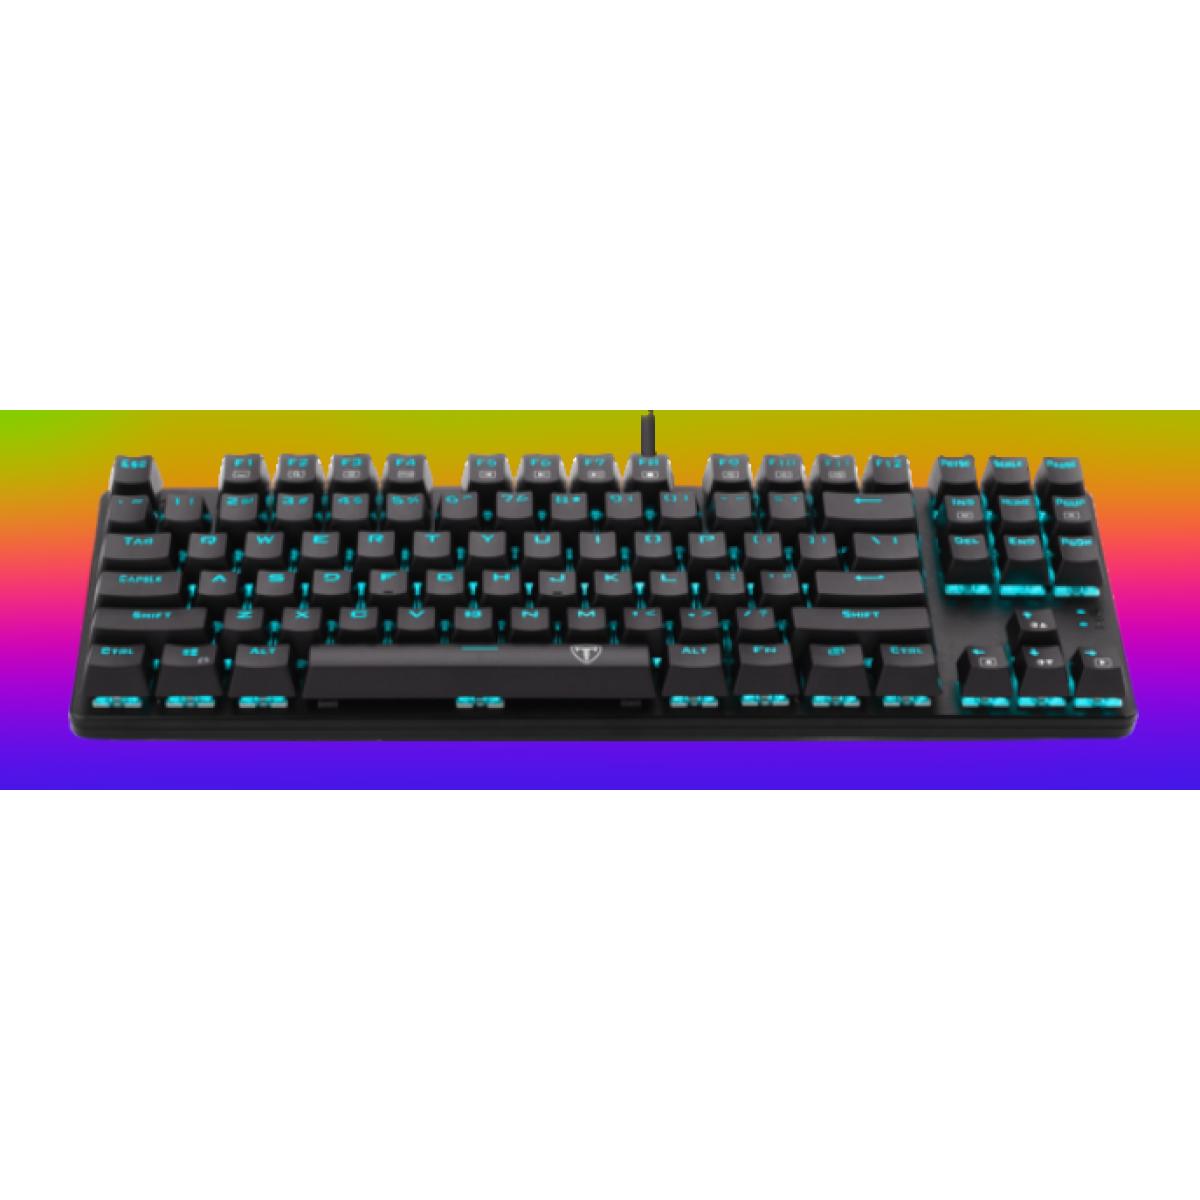 Teclado Gamer Mecânico T-Dagger Bali RGB, Switch Blue, Black, T-TGK311